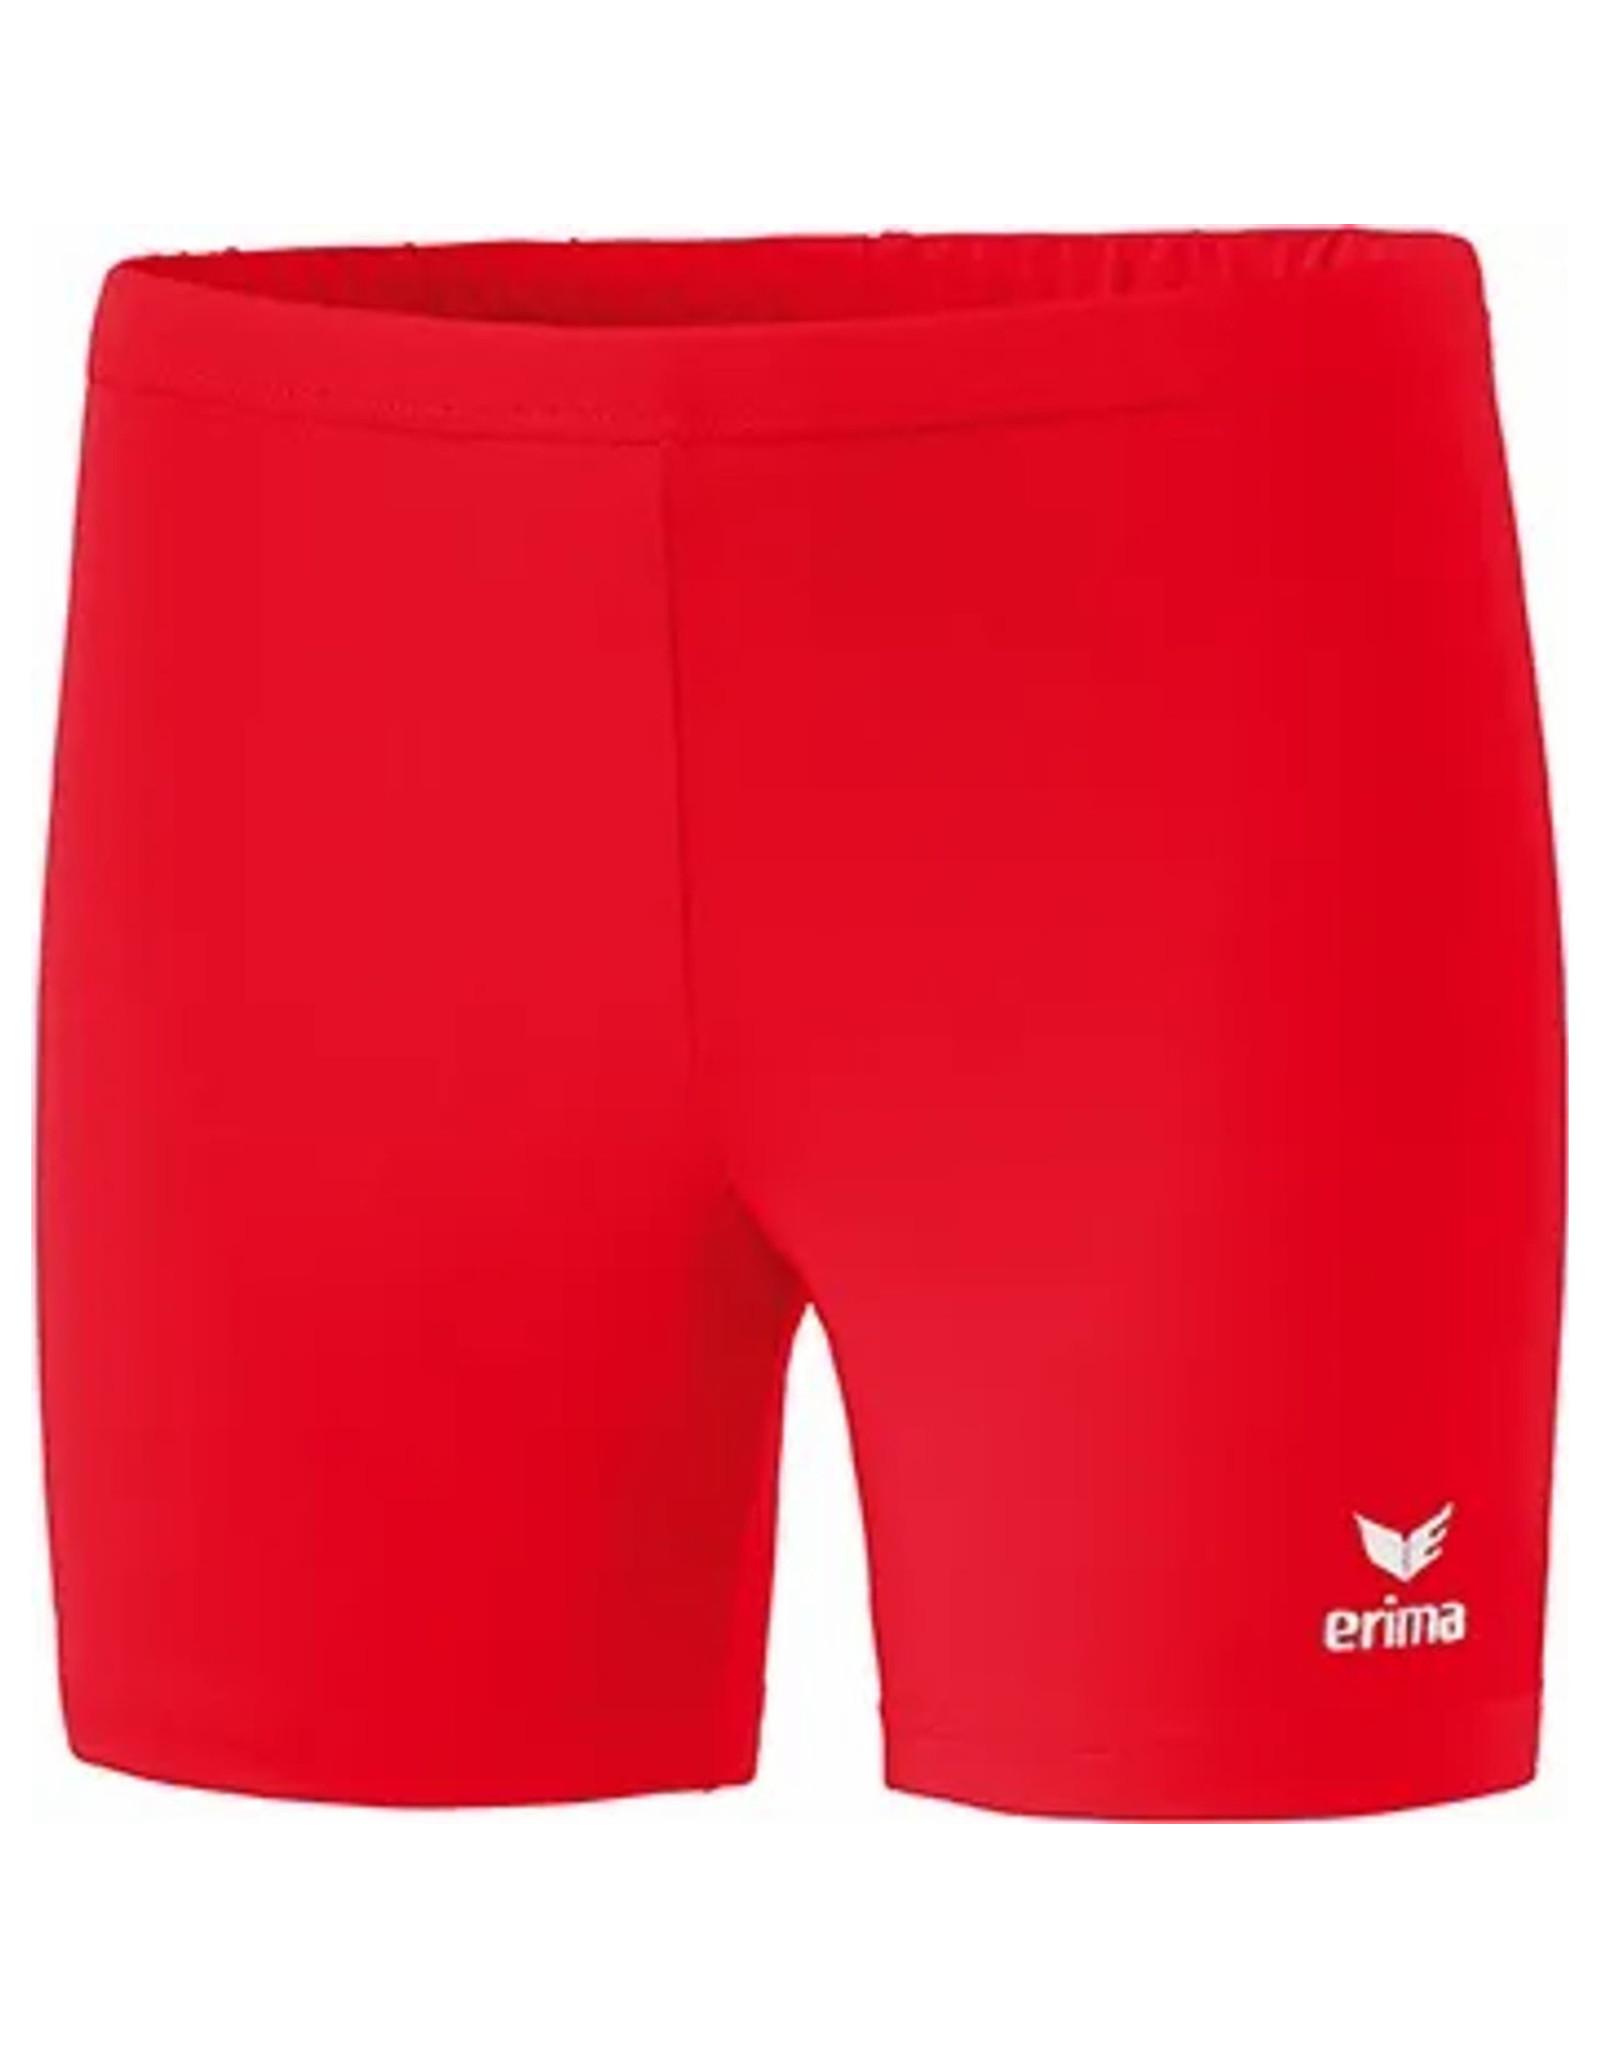 Erima Performance Short Verona-Red-Dames